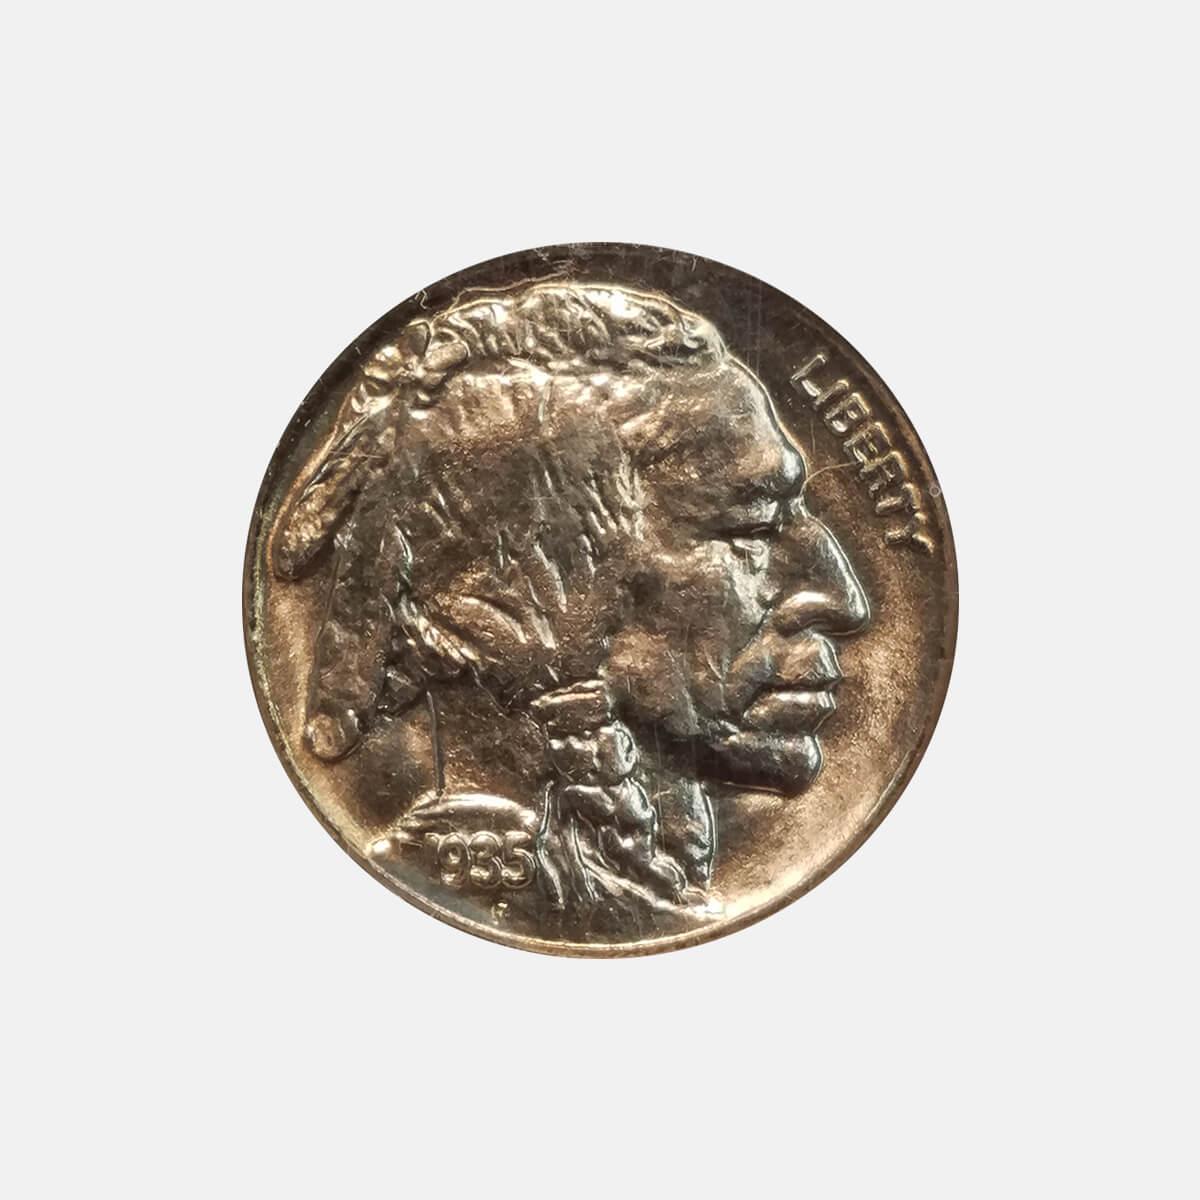 greater milwaukee coin brookfield